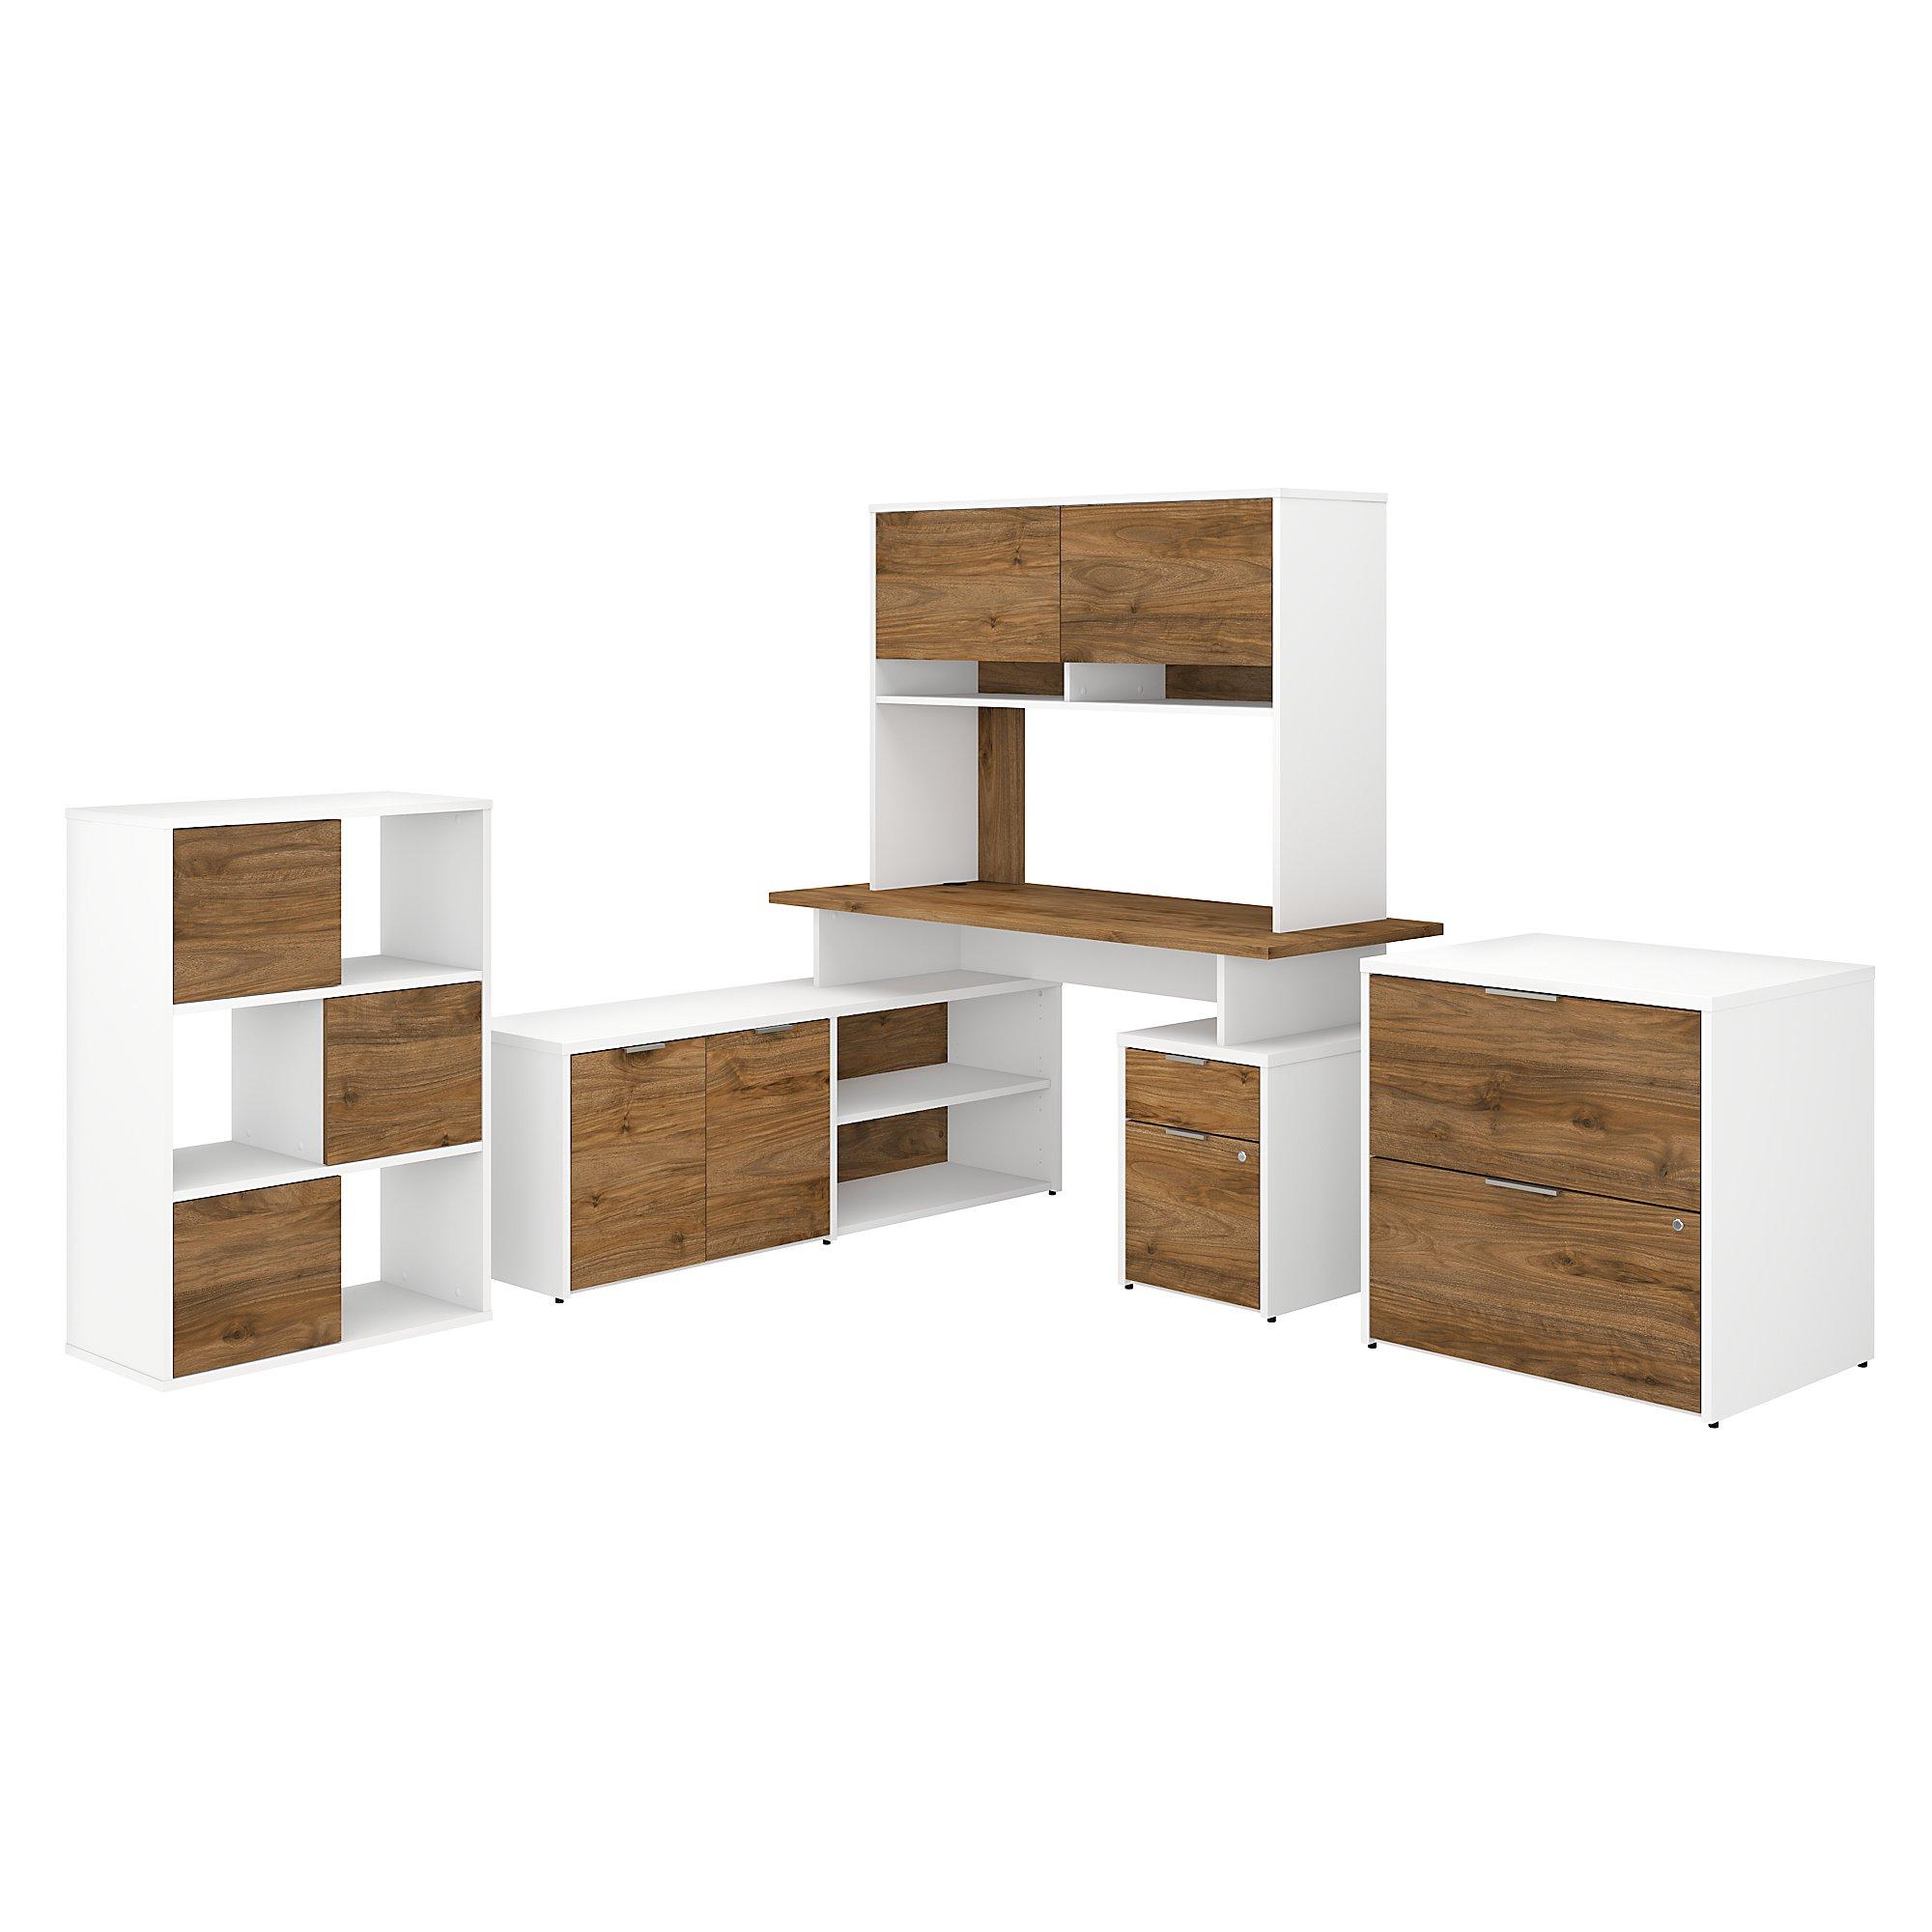 bbf jamestown jtn024 desk configuration with walnut and white finish